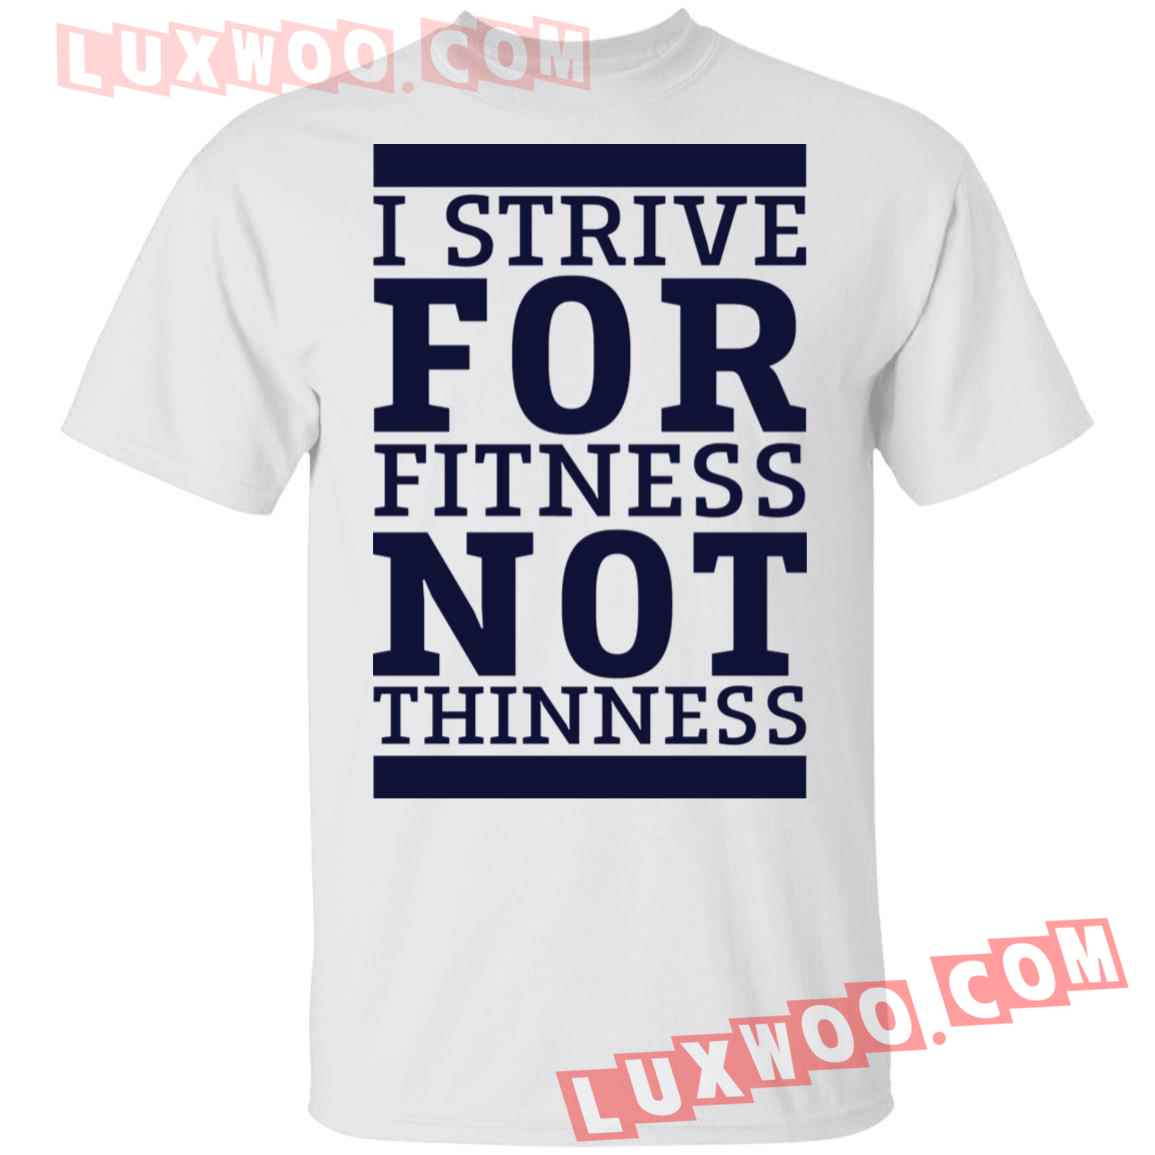 I Strive For Fitness Not Thinness Shirt